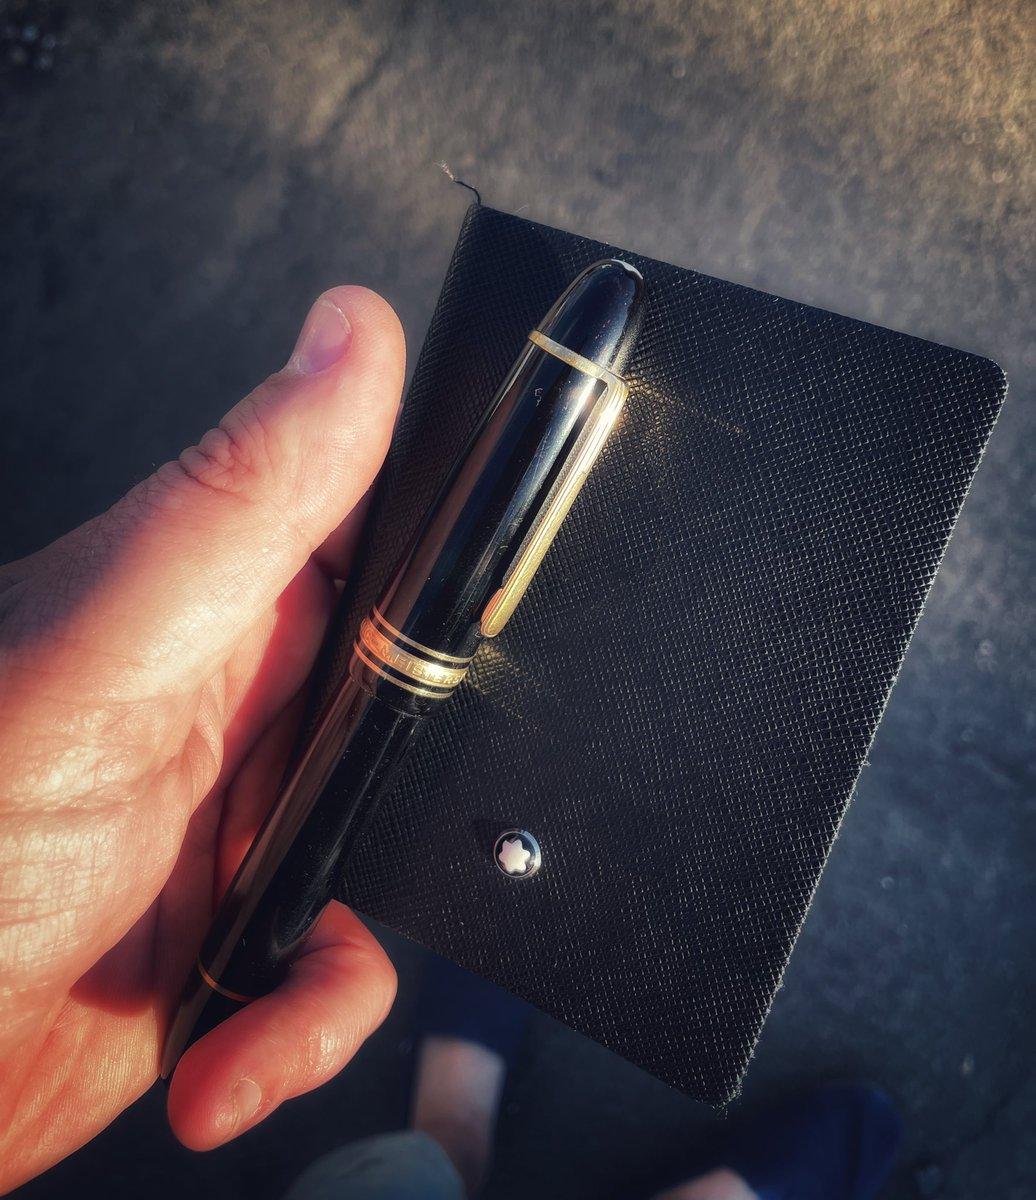 Keepin it #classy.  @montblanc_world   #pen #pens #fountainpen #montblanc #meisterstück149 #writing #write #amwriting